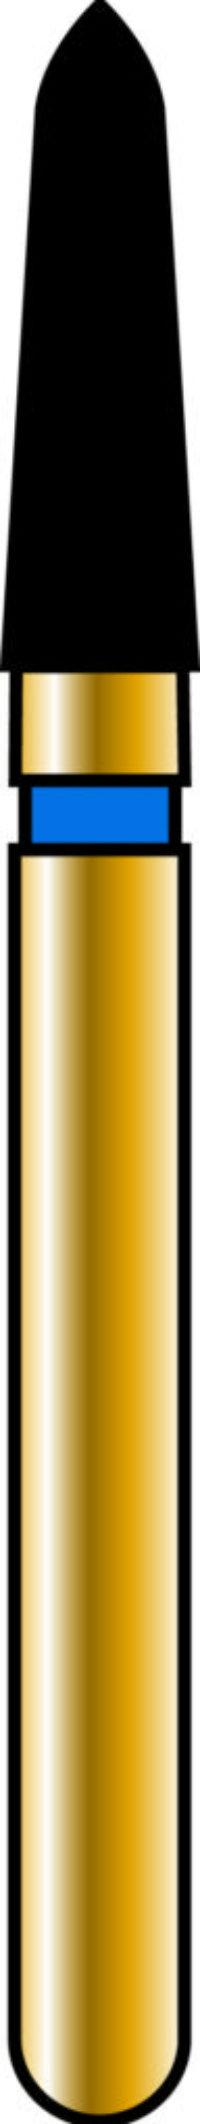 Pointed Taper 18-6mm Gold Diamond Bur